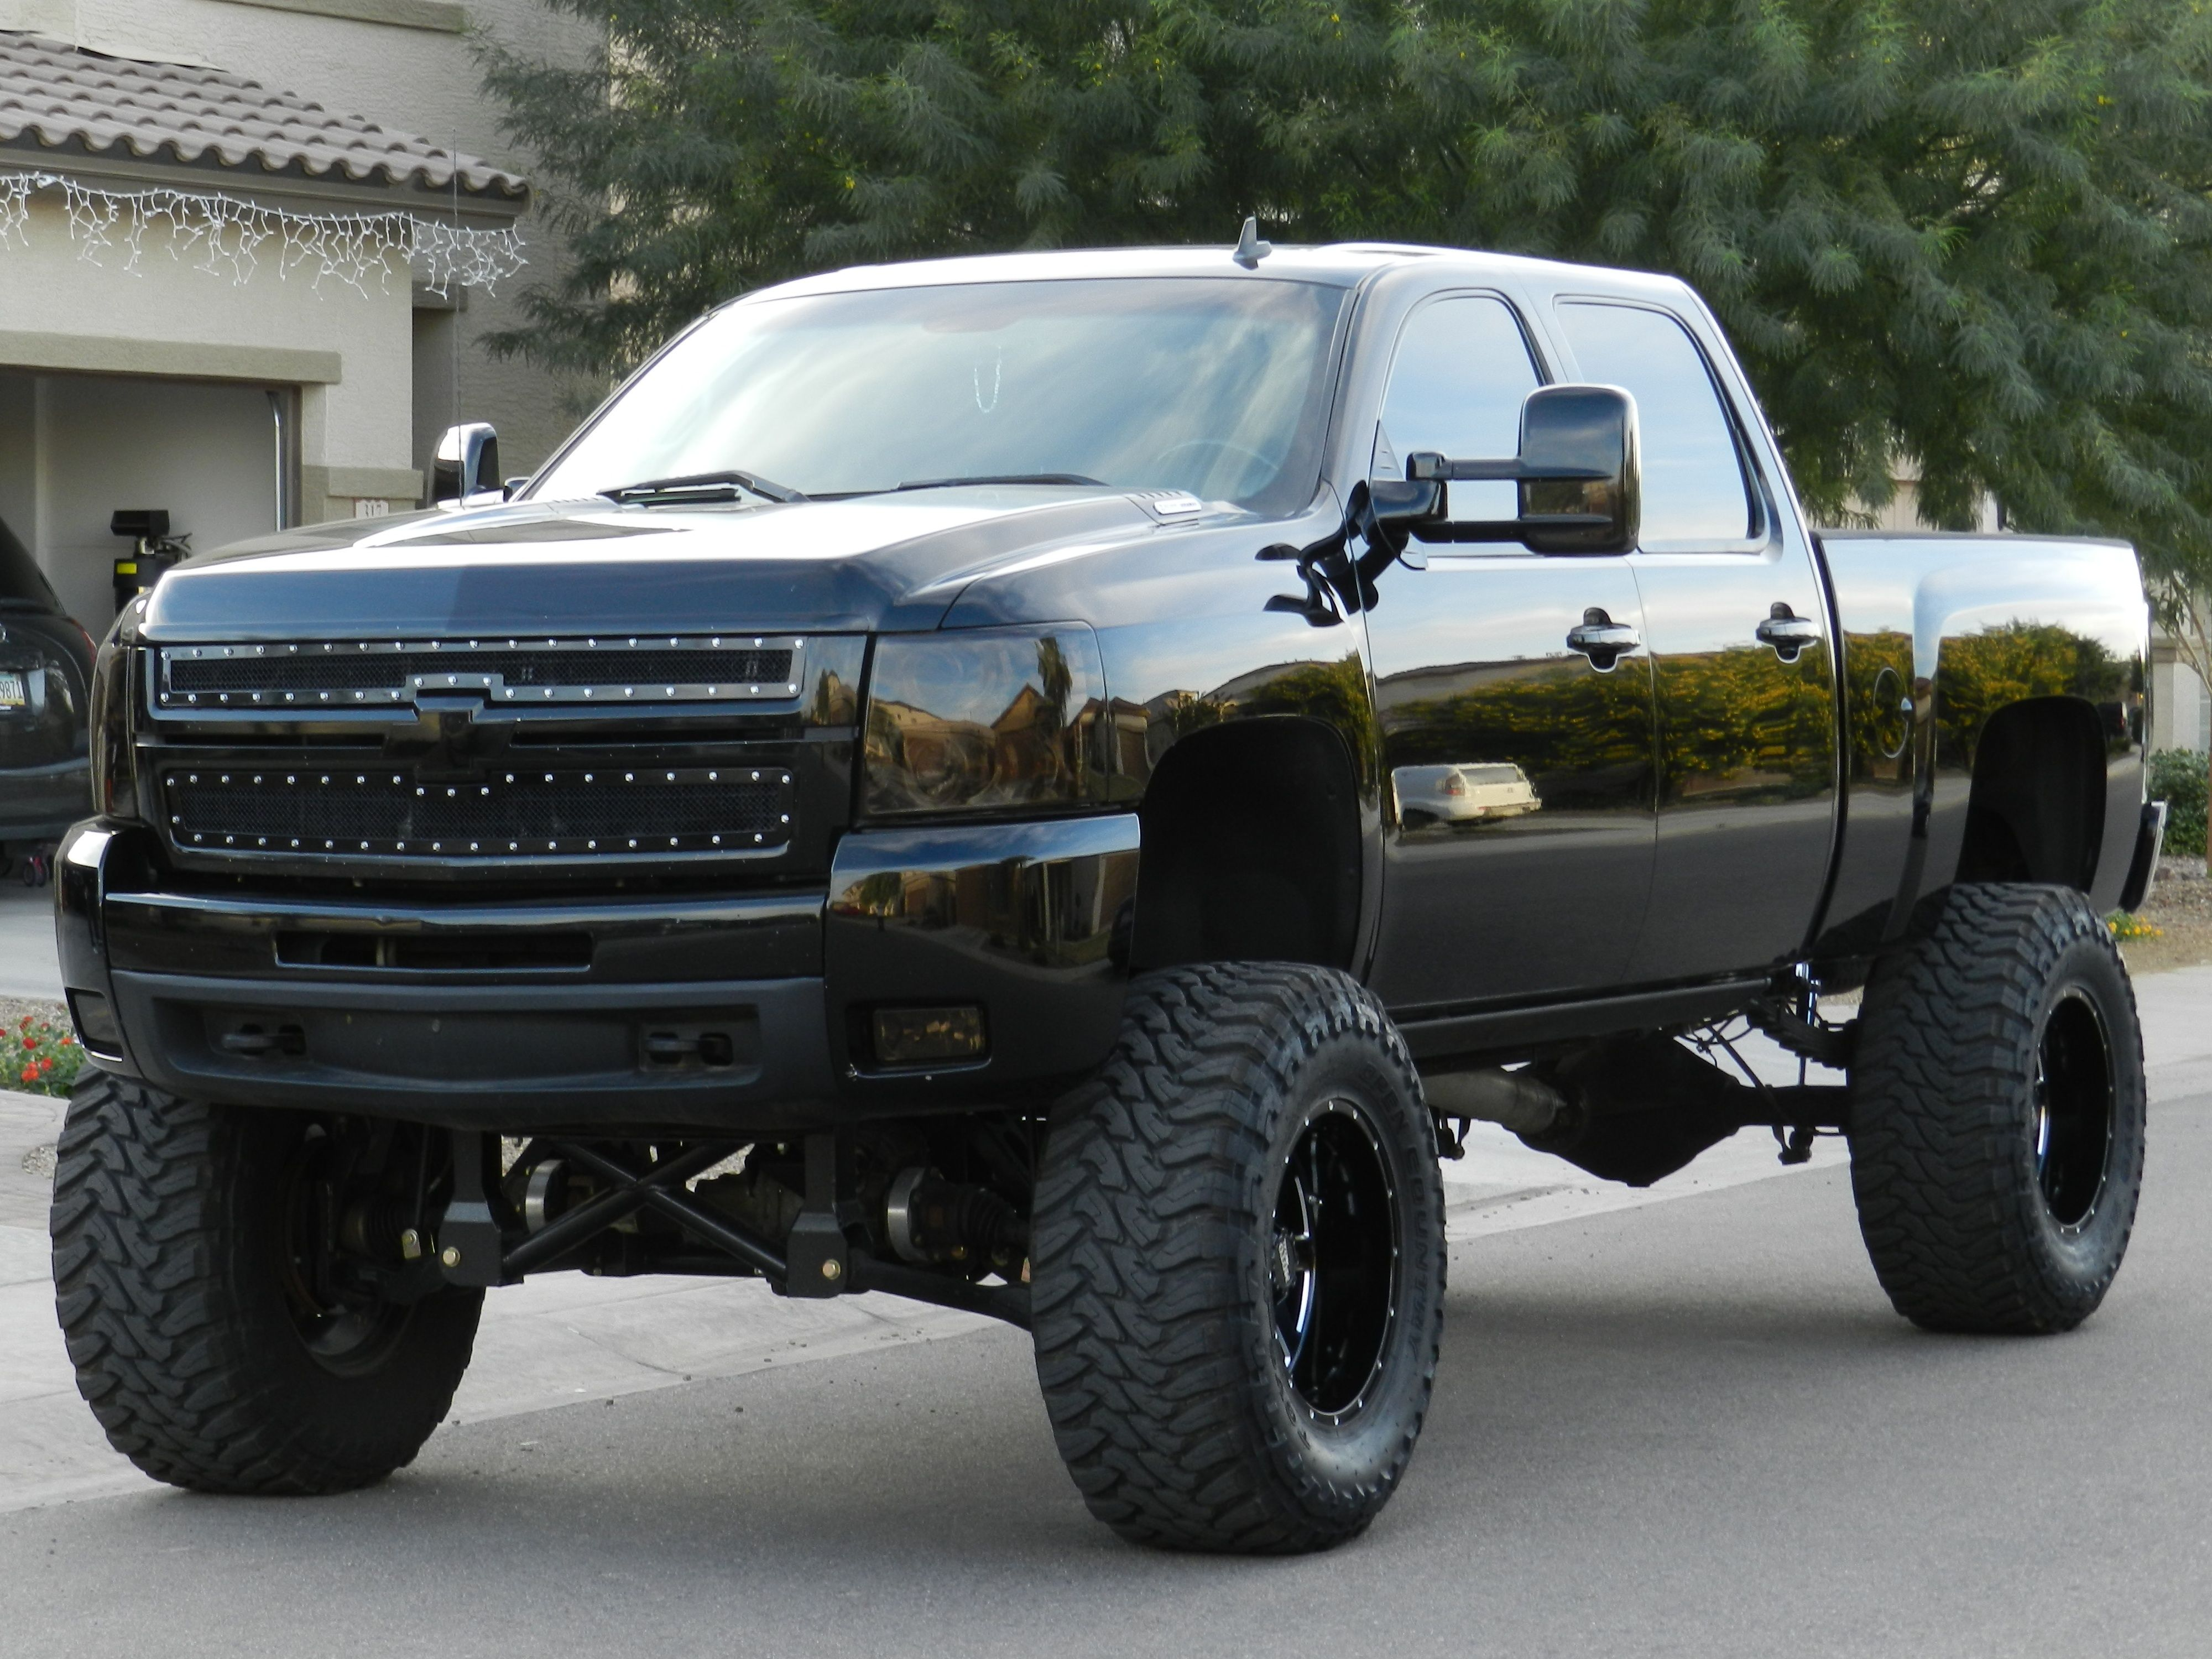 great Mud Mudder trucks | Quench my thirst with gasoline ...